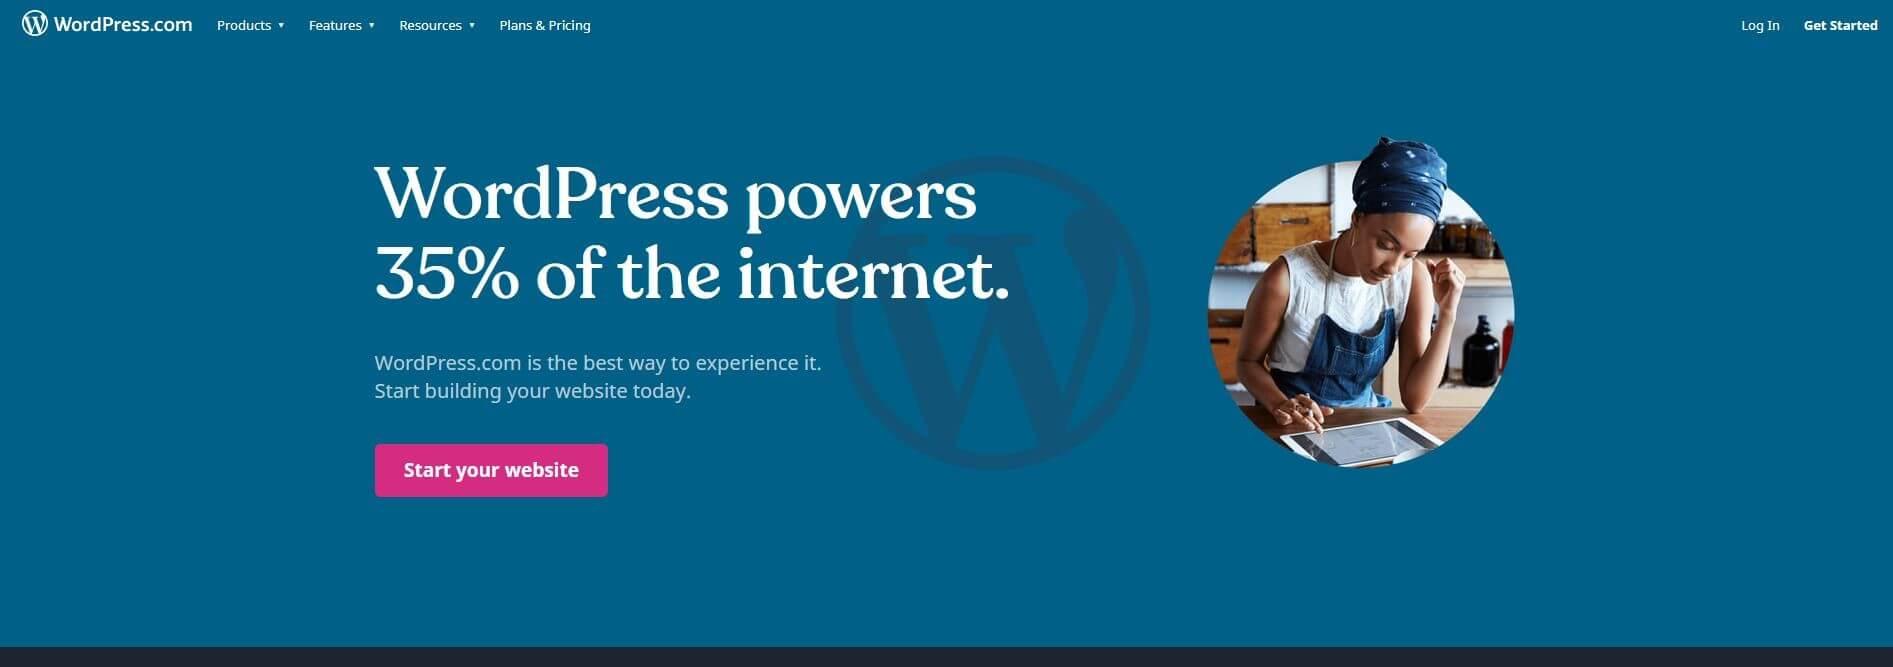 Homepage of WordPress